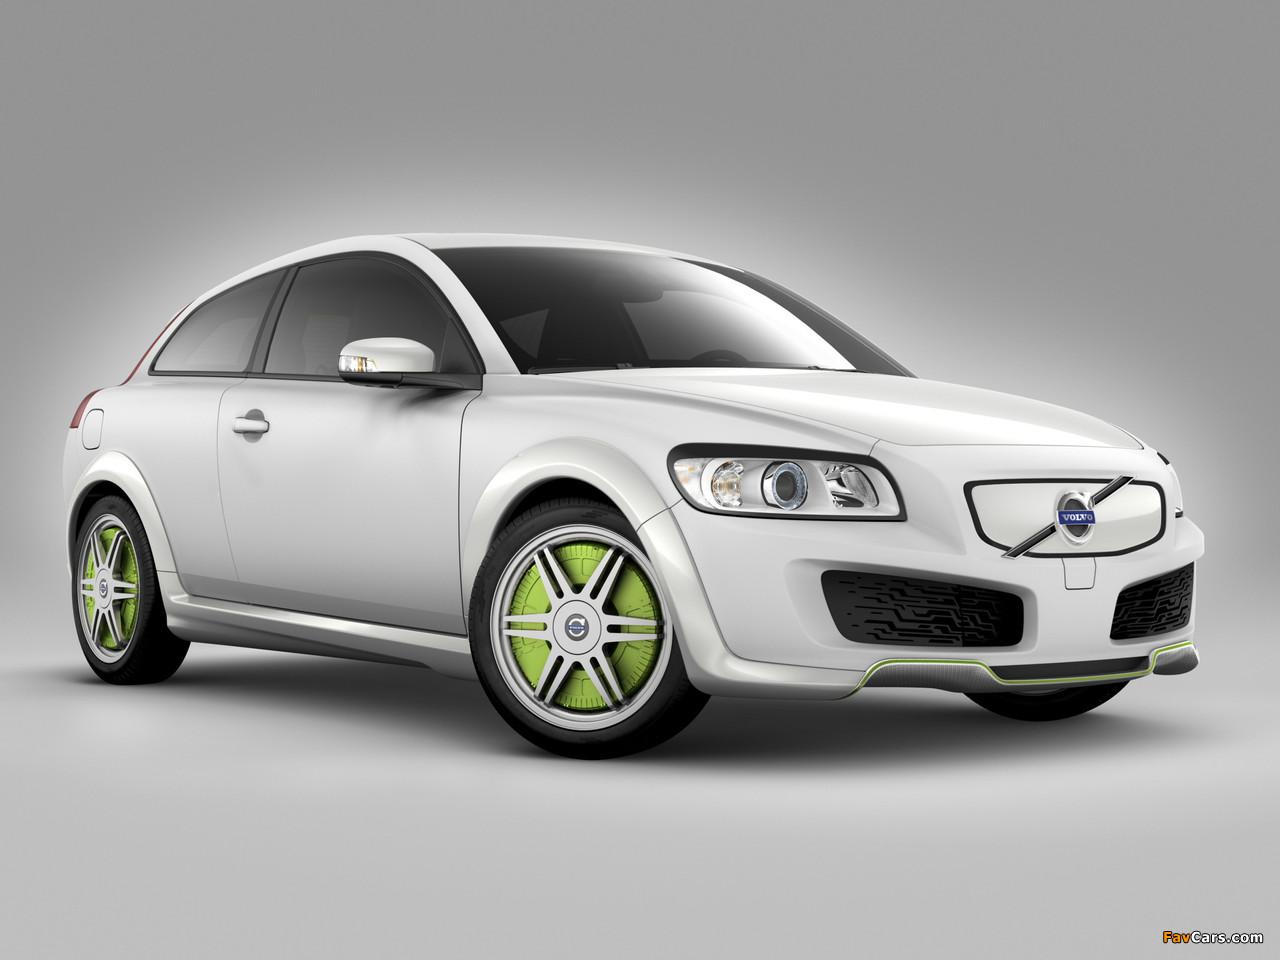 Volvo C30 ReCharge Concept 2007 images (1280 x 960)